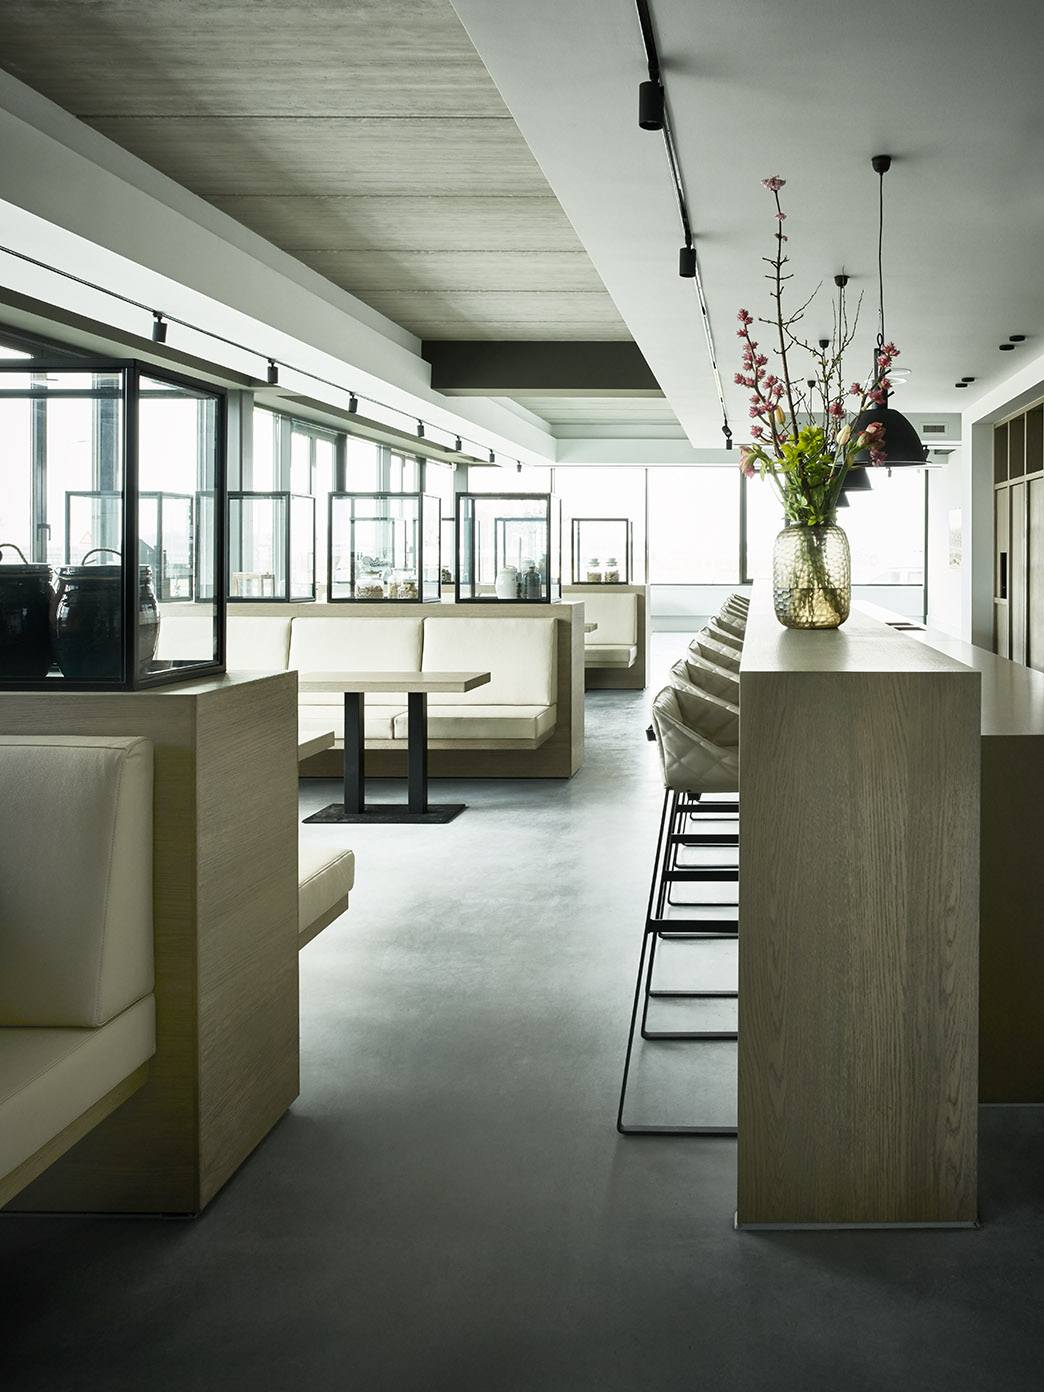 Riverdale headquarters with KEKKE bar stool